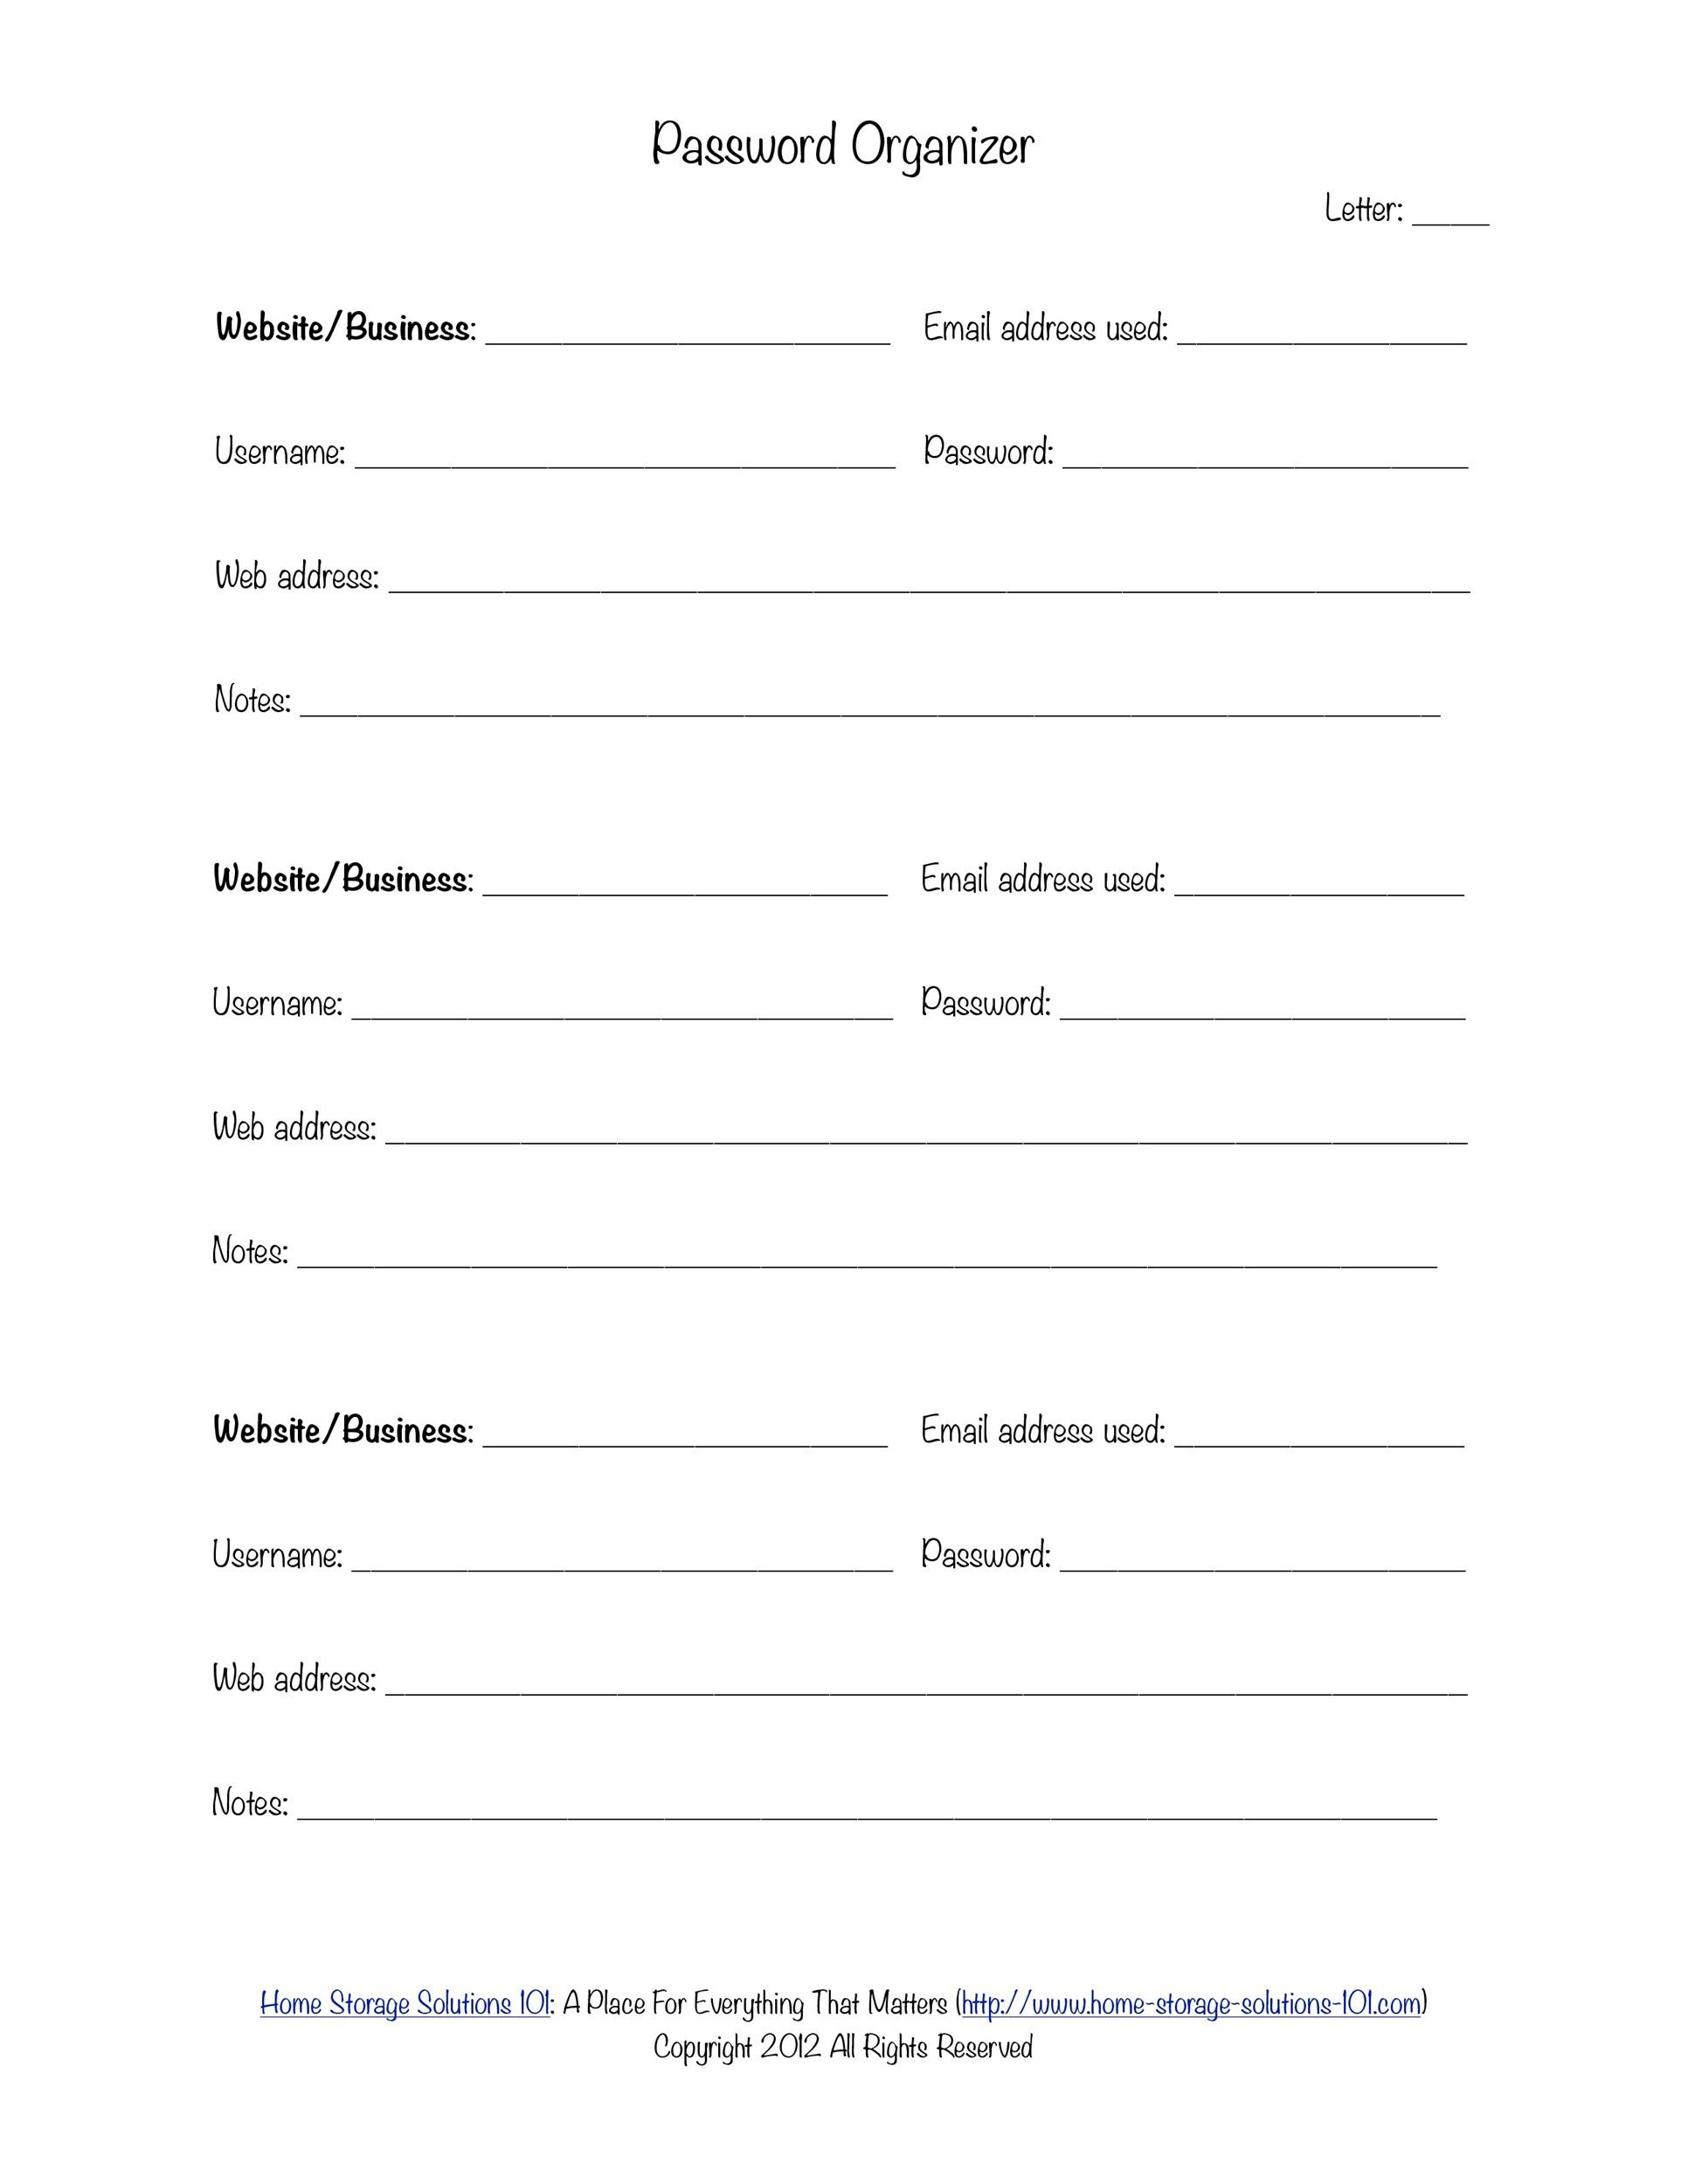 Free password list template 36